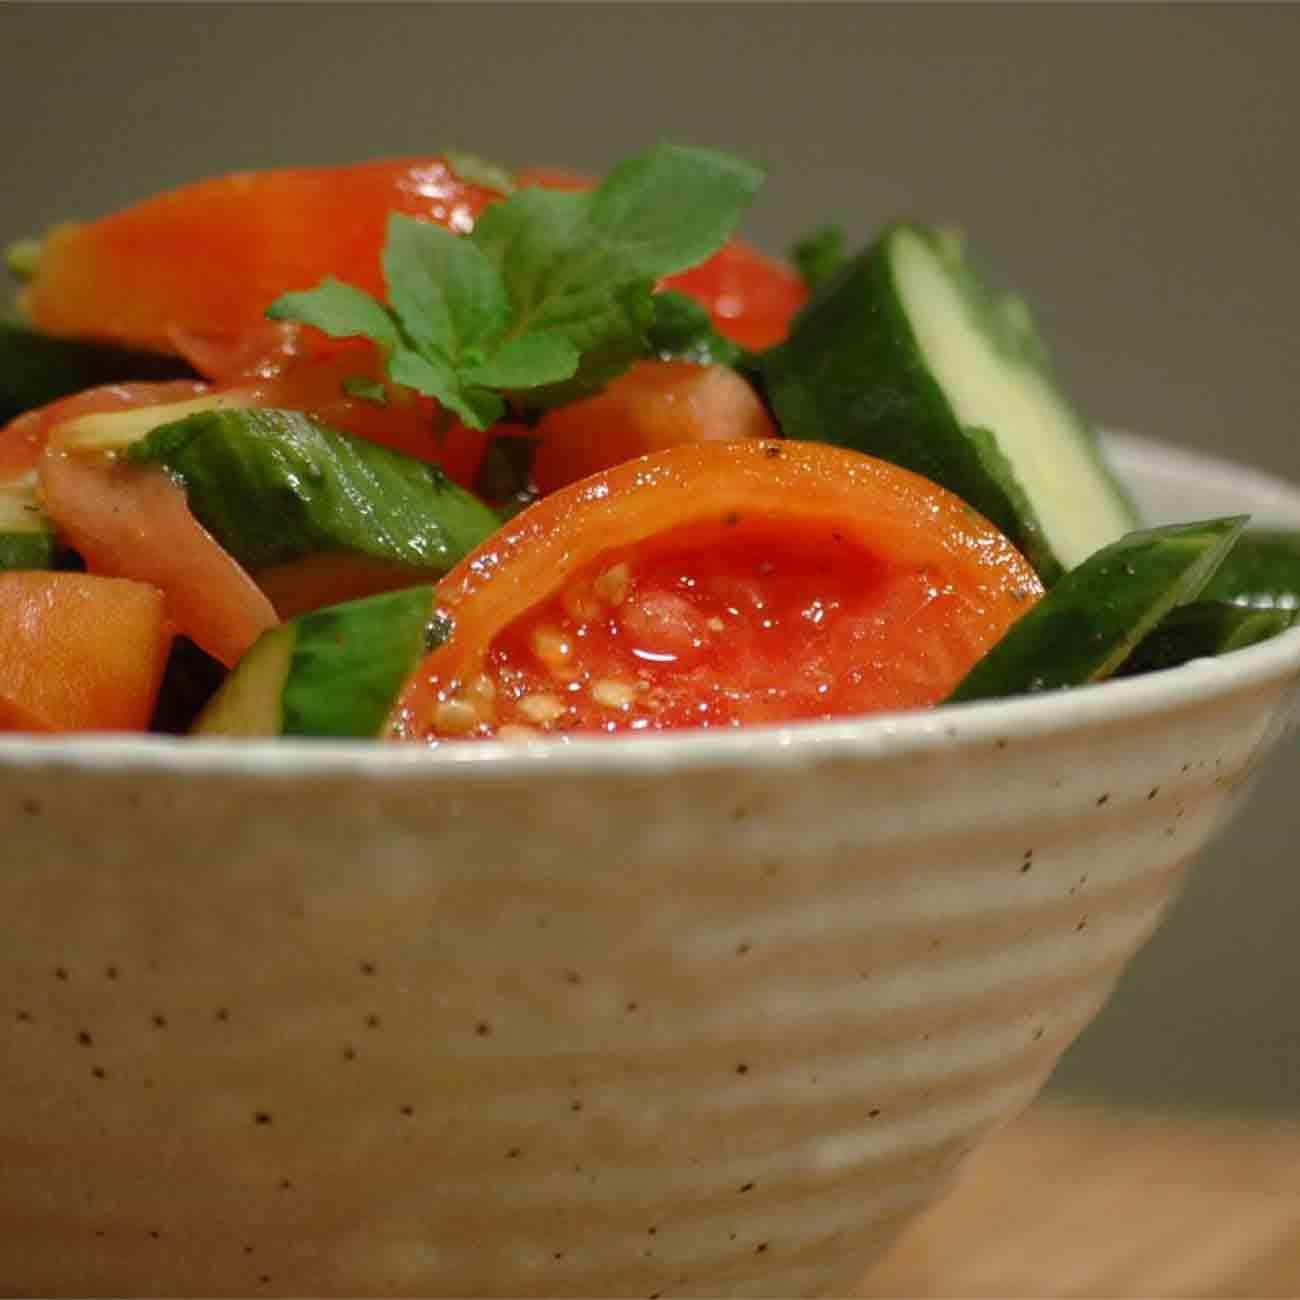 Tomato Cucumber Salad with Mint Recipe